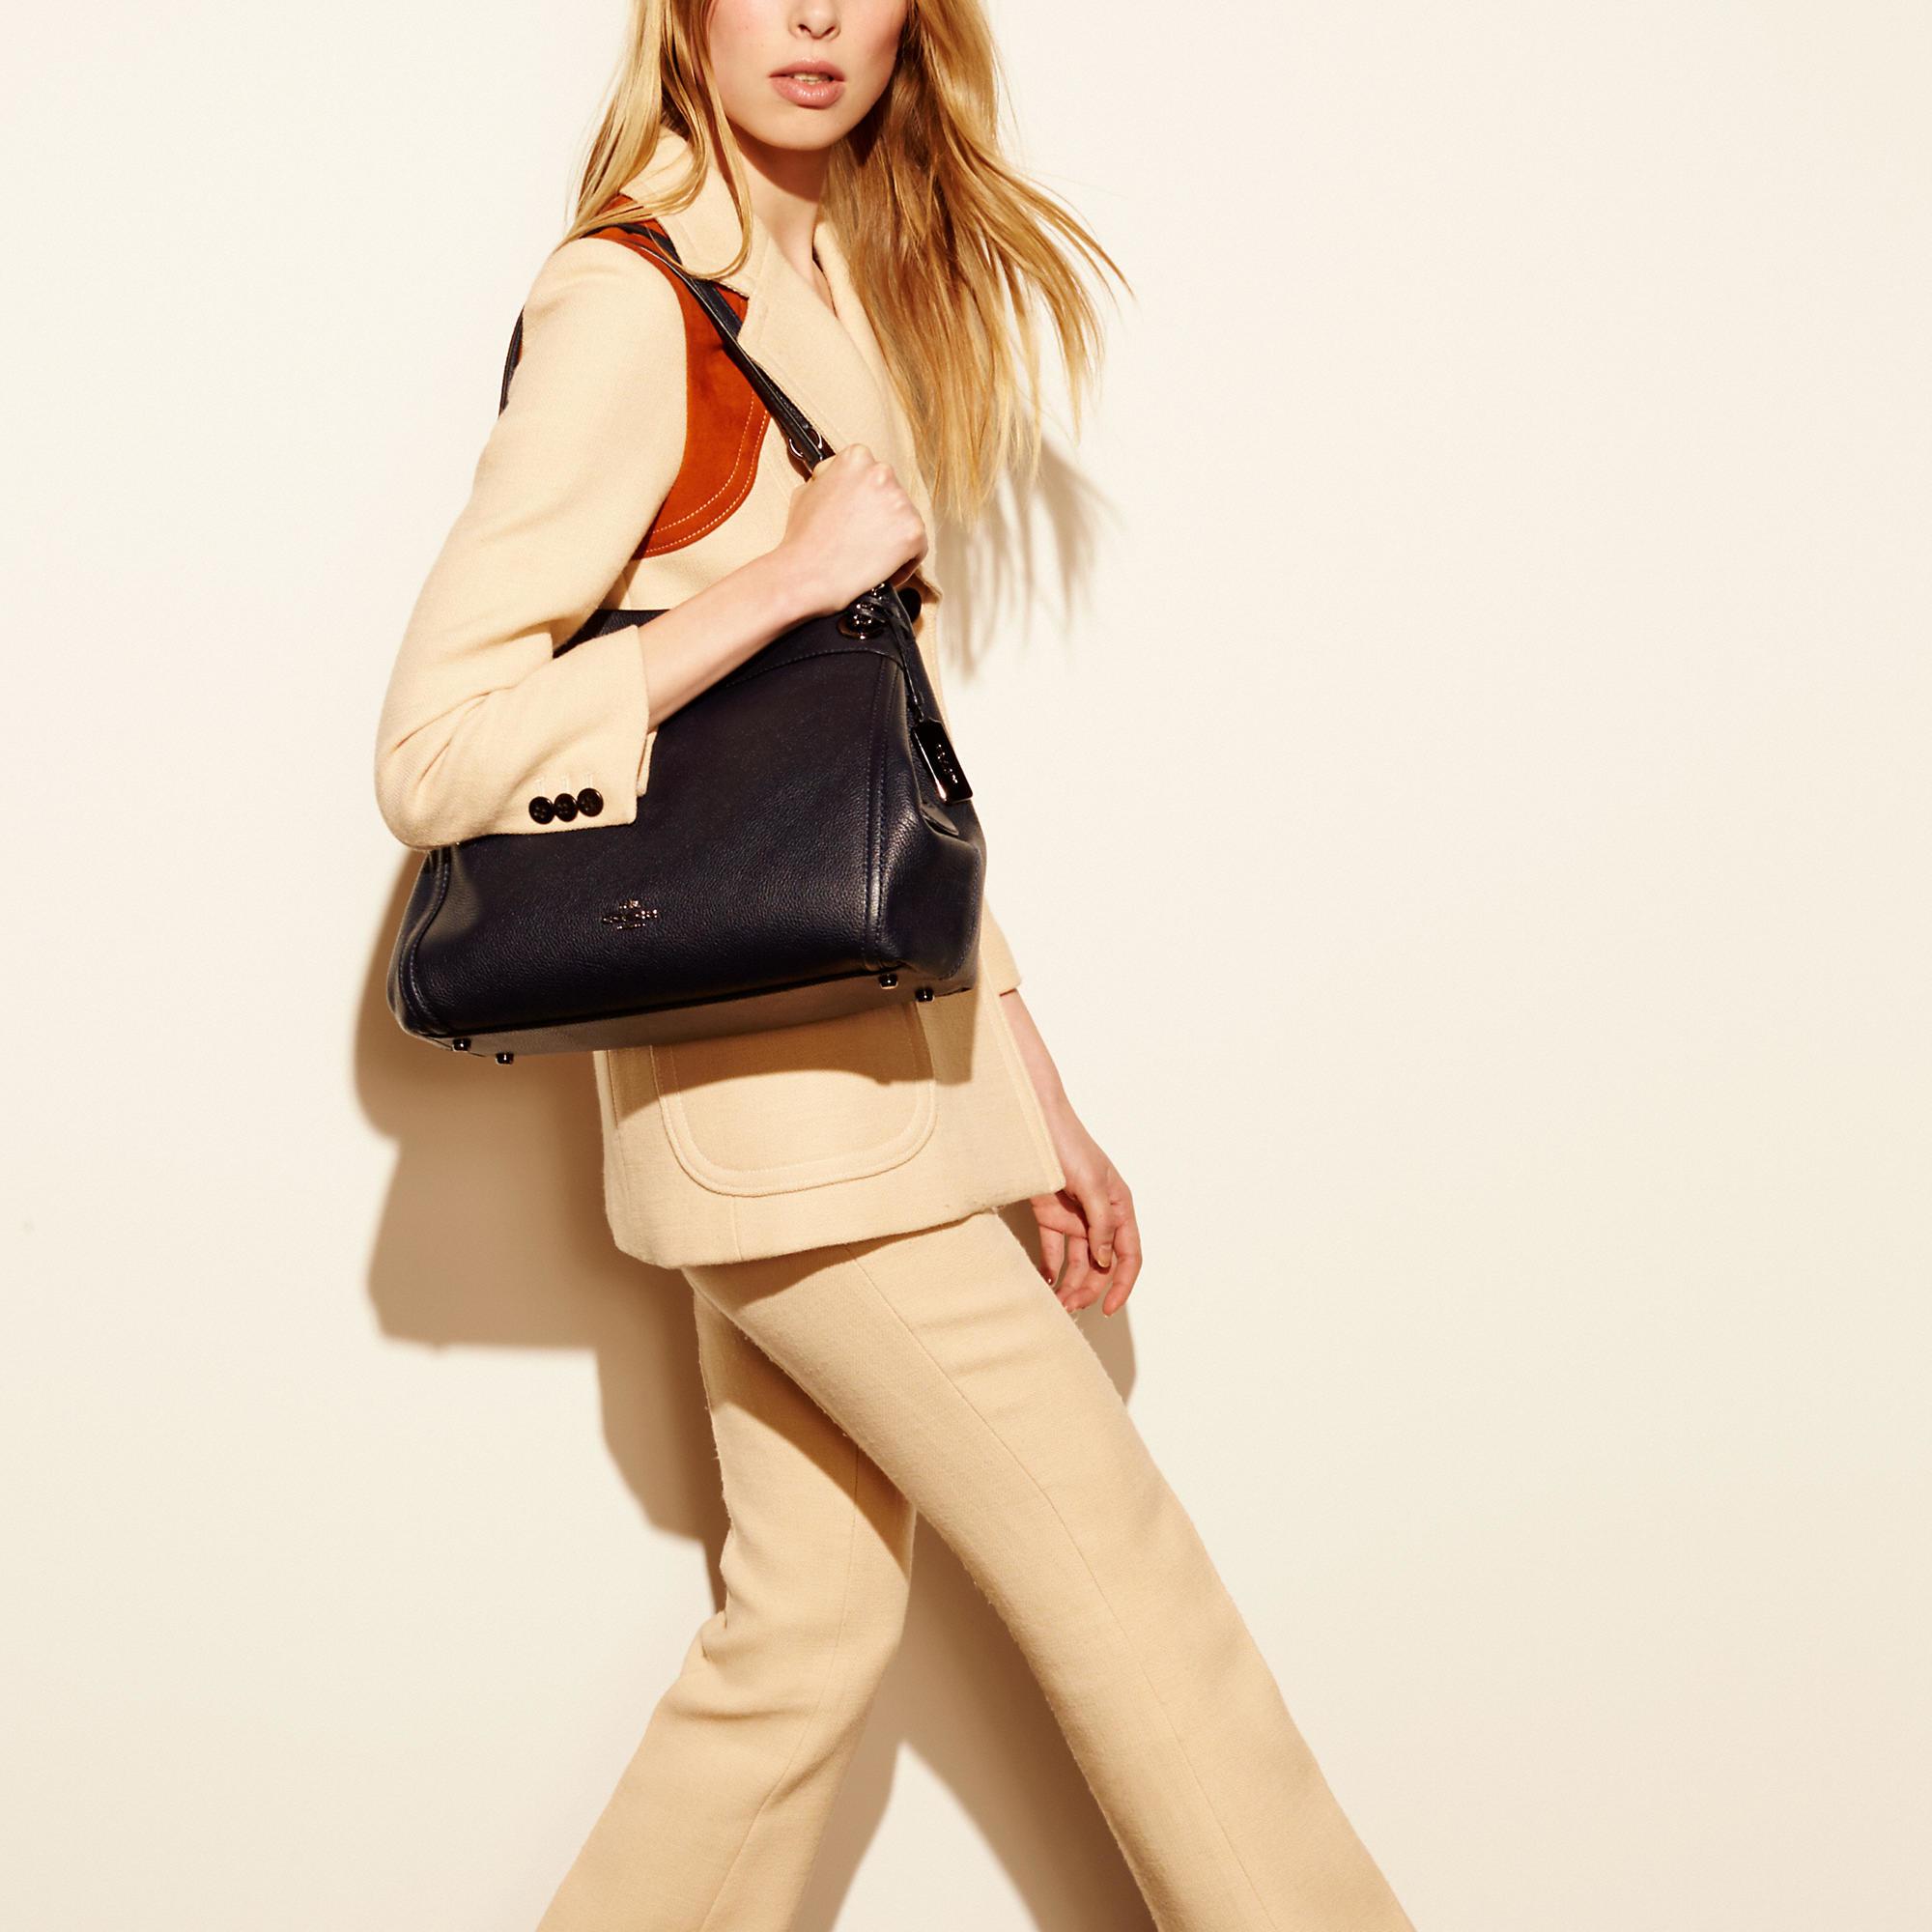 f68feb61 COACH Black Turnlock Edie Shoulder Bag In Polished Pebble Leather